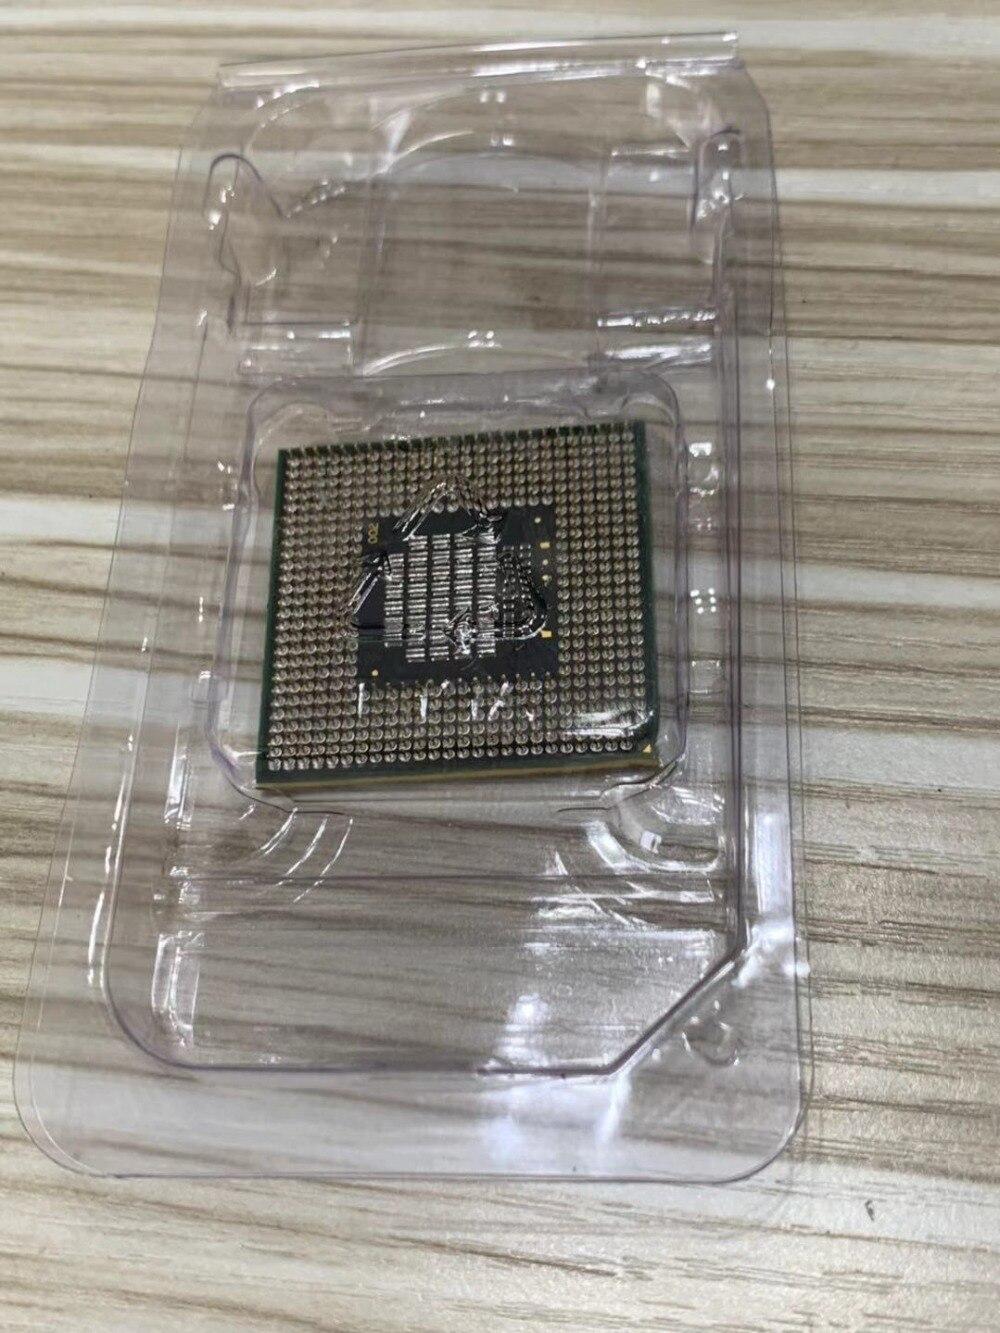 ЦП T9550 9550 6 Мб кэш/2,66 ГГц/1066/двухъядерный разъем 479GM45/PM45